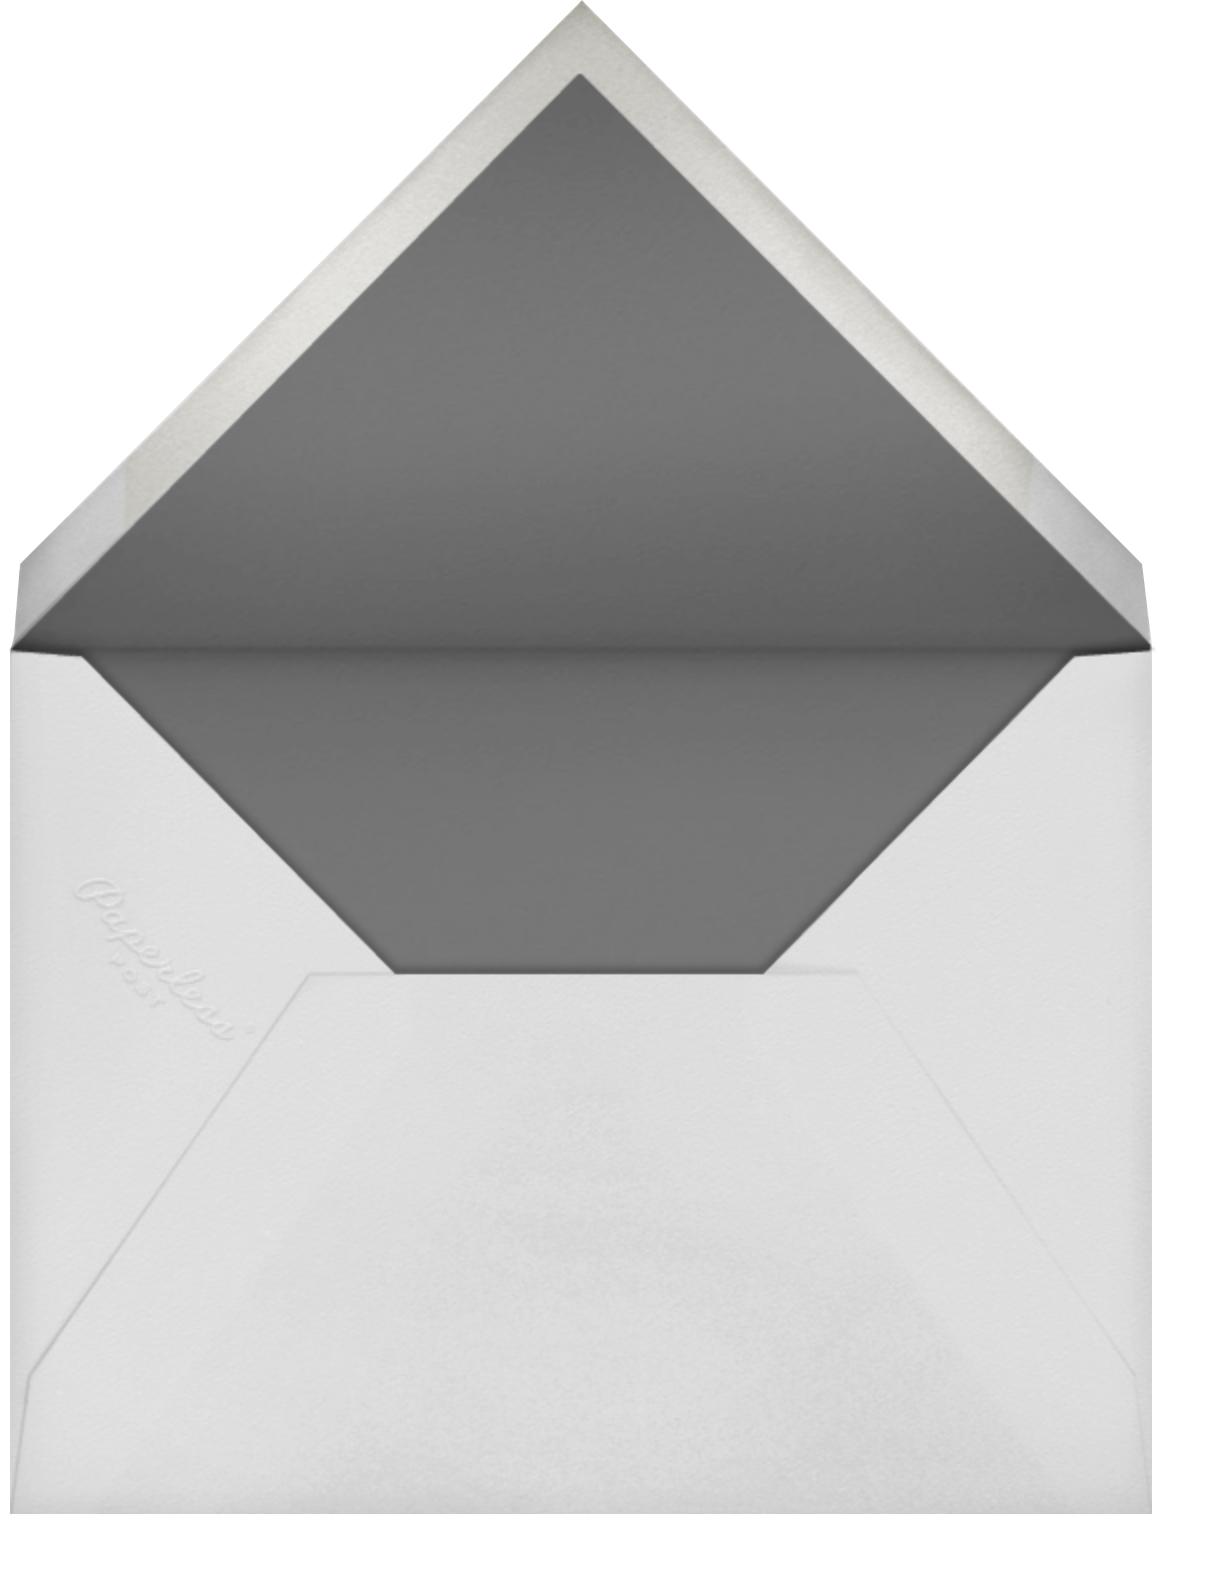 Ticket Holder (Tall) - Paperless Post - Adult birthday - envelope back